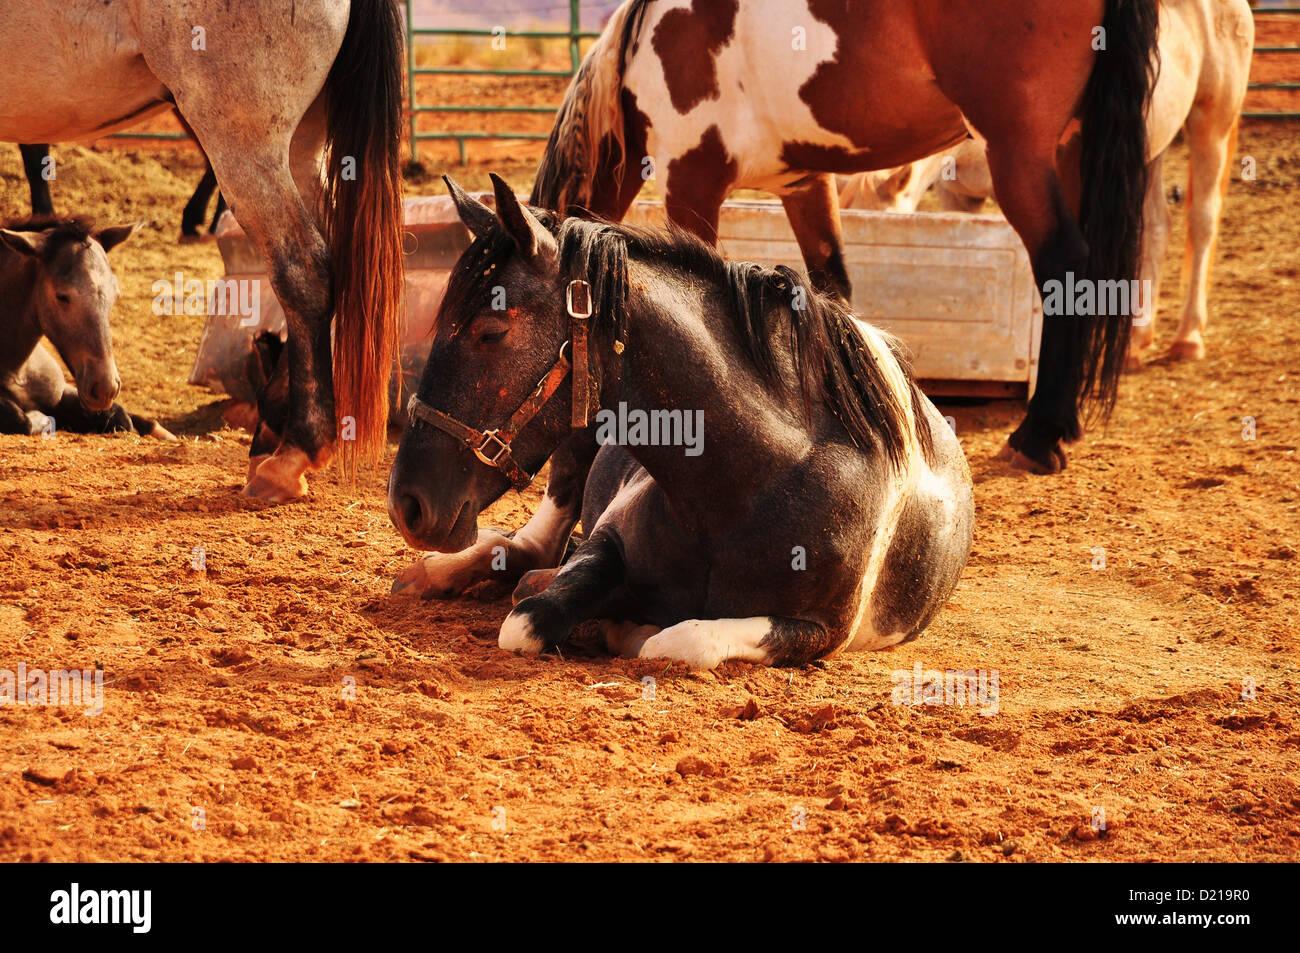 Navajo Horse - Stock Image